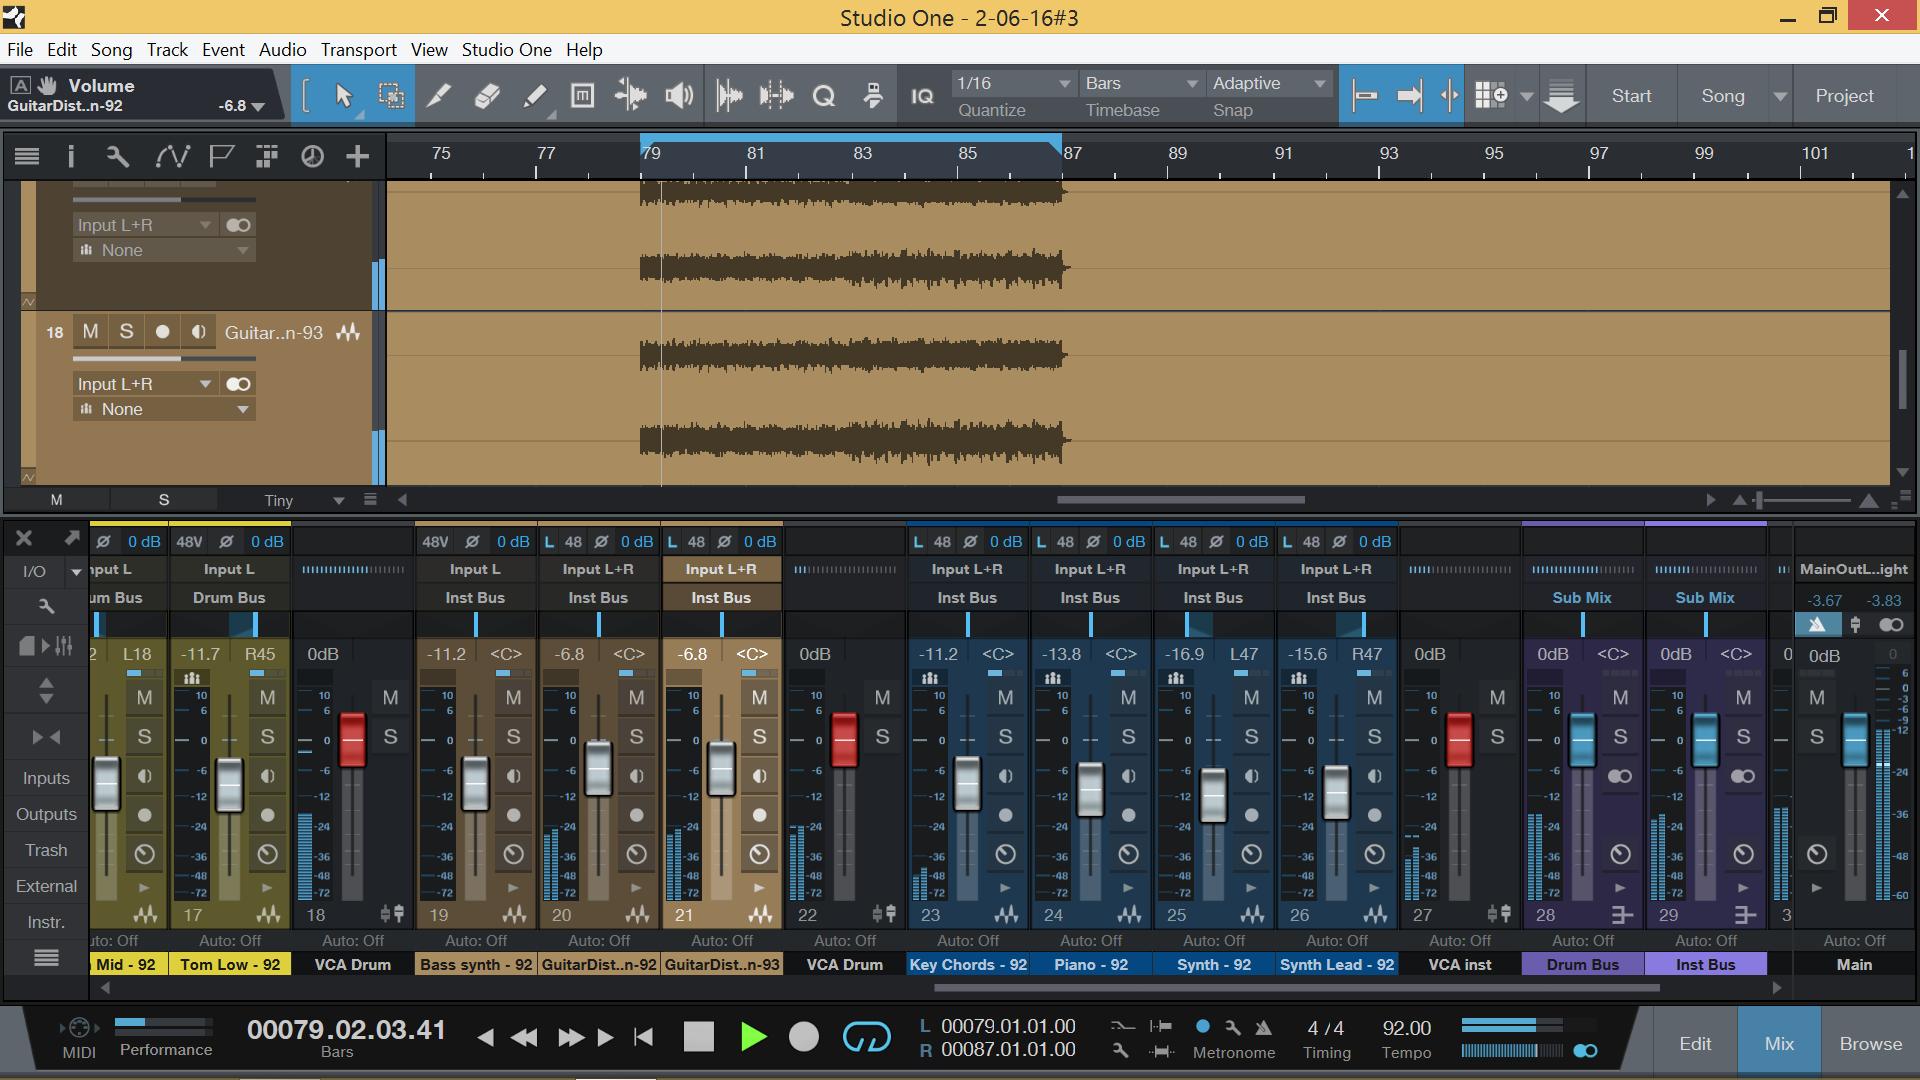 Signals2Sounds - Studio equipment, software and instrument list